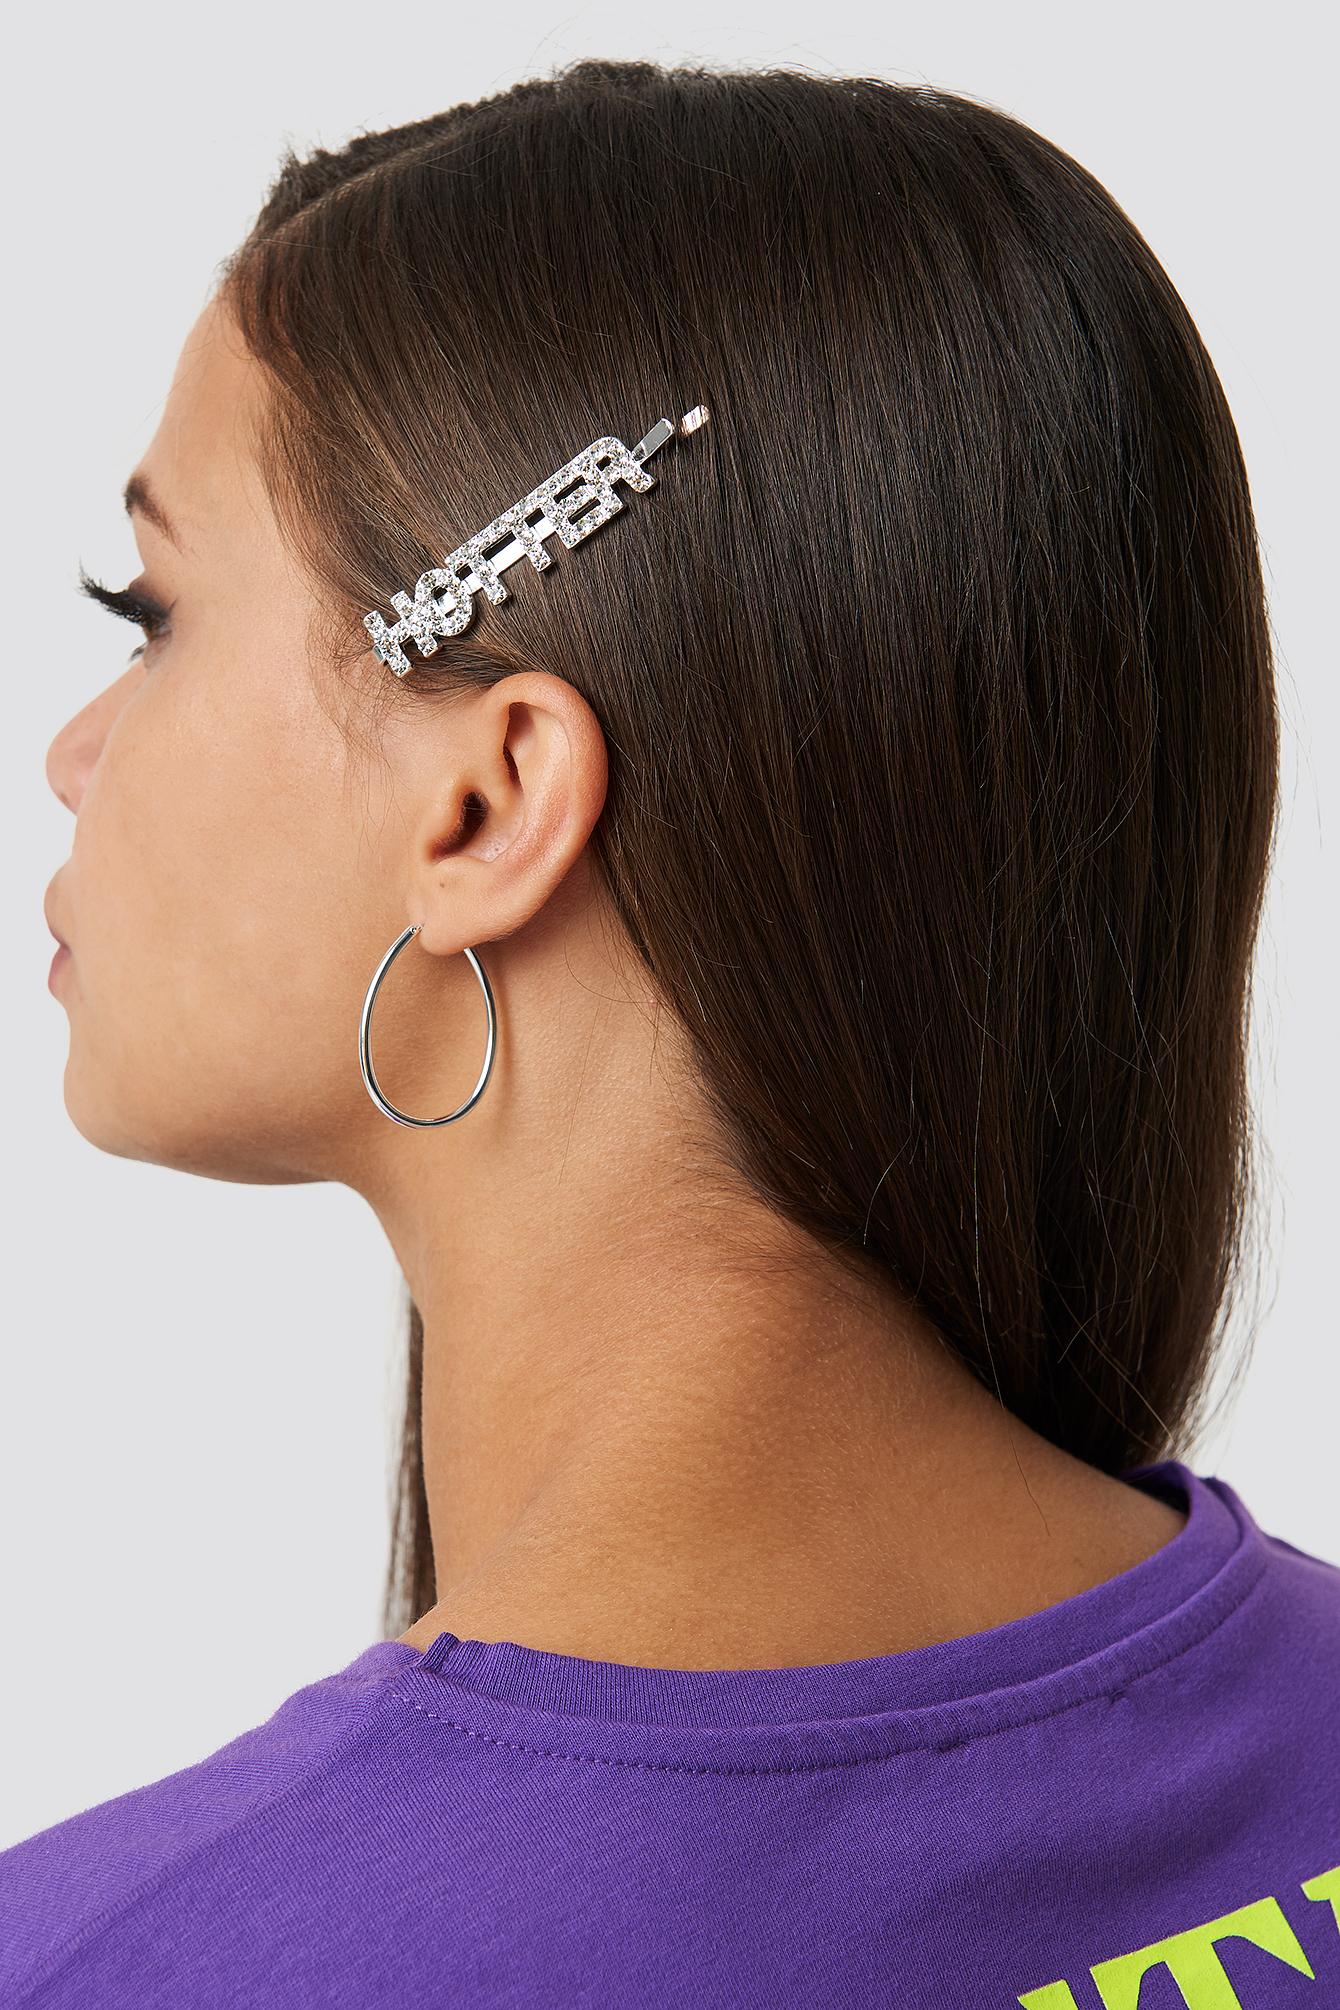 Hotter Rhinestone Hairclip - Silver